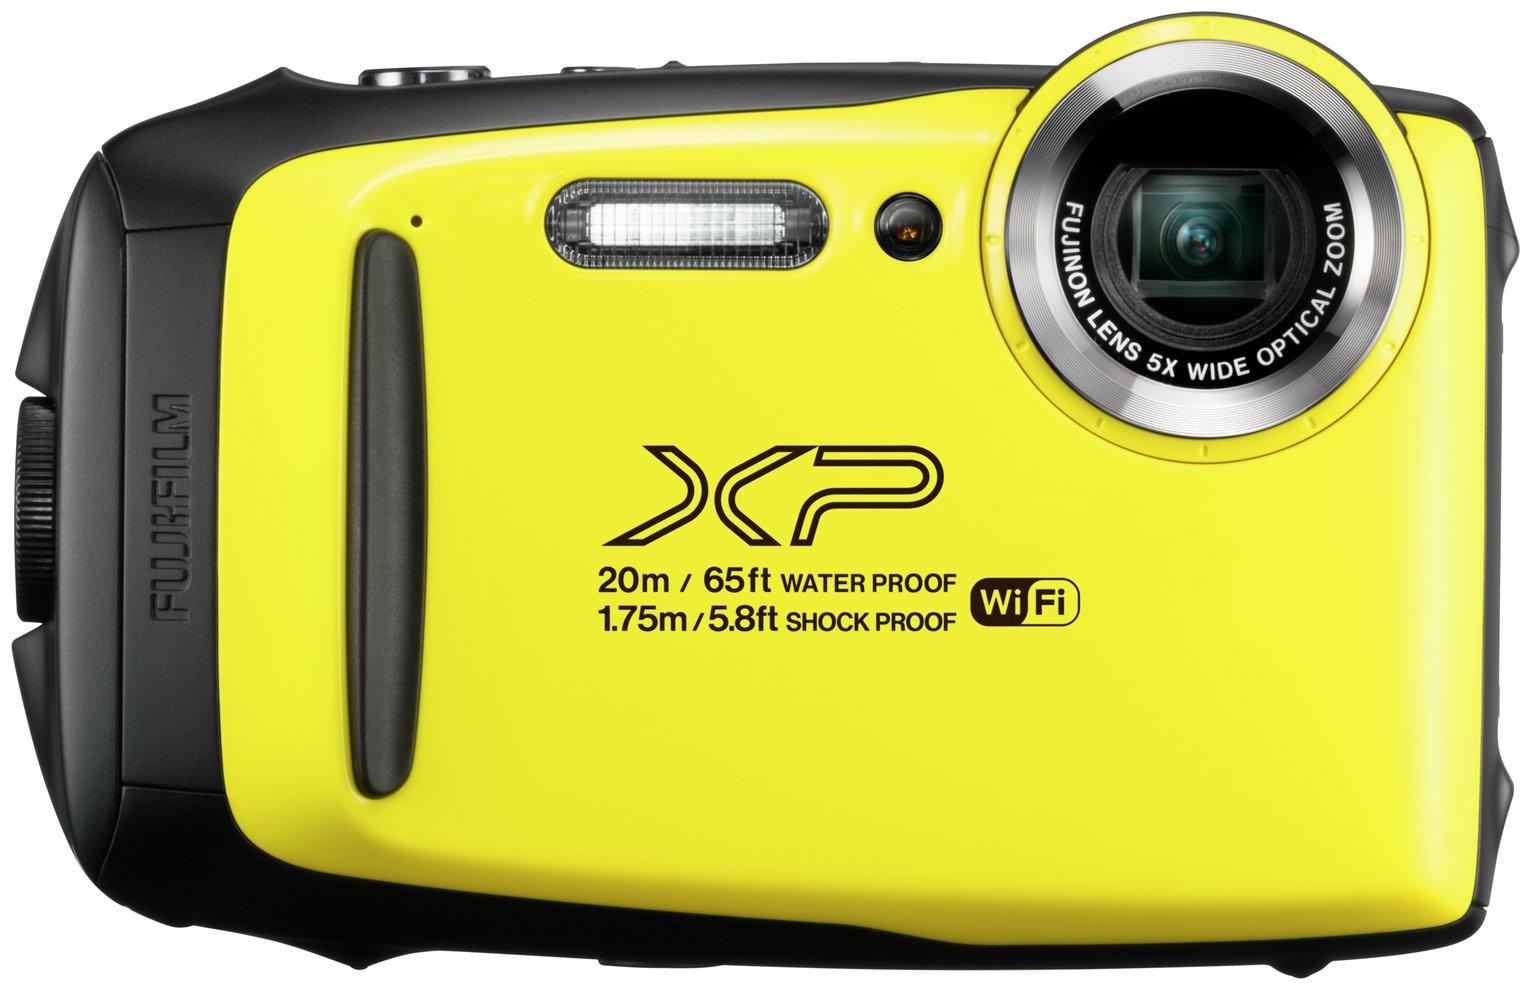 FujiFilm XP130 Tough Camera 5X 16.4MP - Yellow